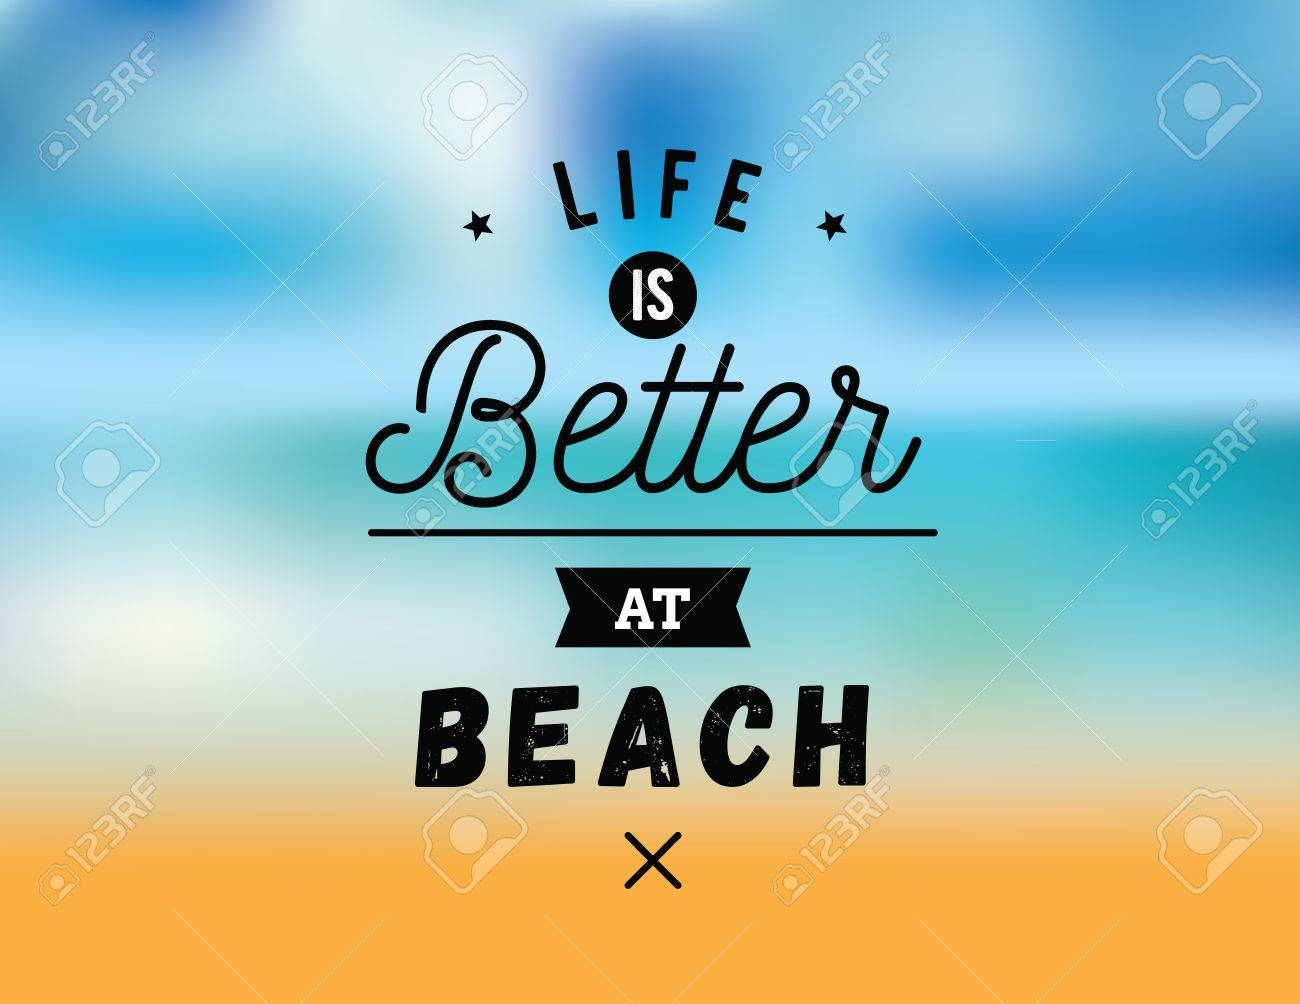 Life is better at beach creative romantic inspirational quote life is better at beach creative romantic inspirational quote vector graphic text kristyandbryce Gallery